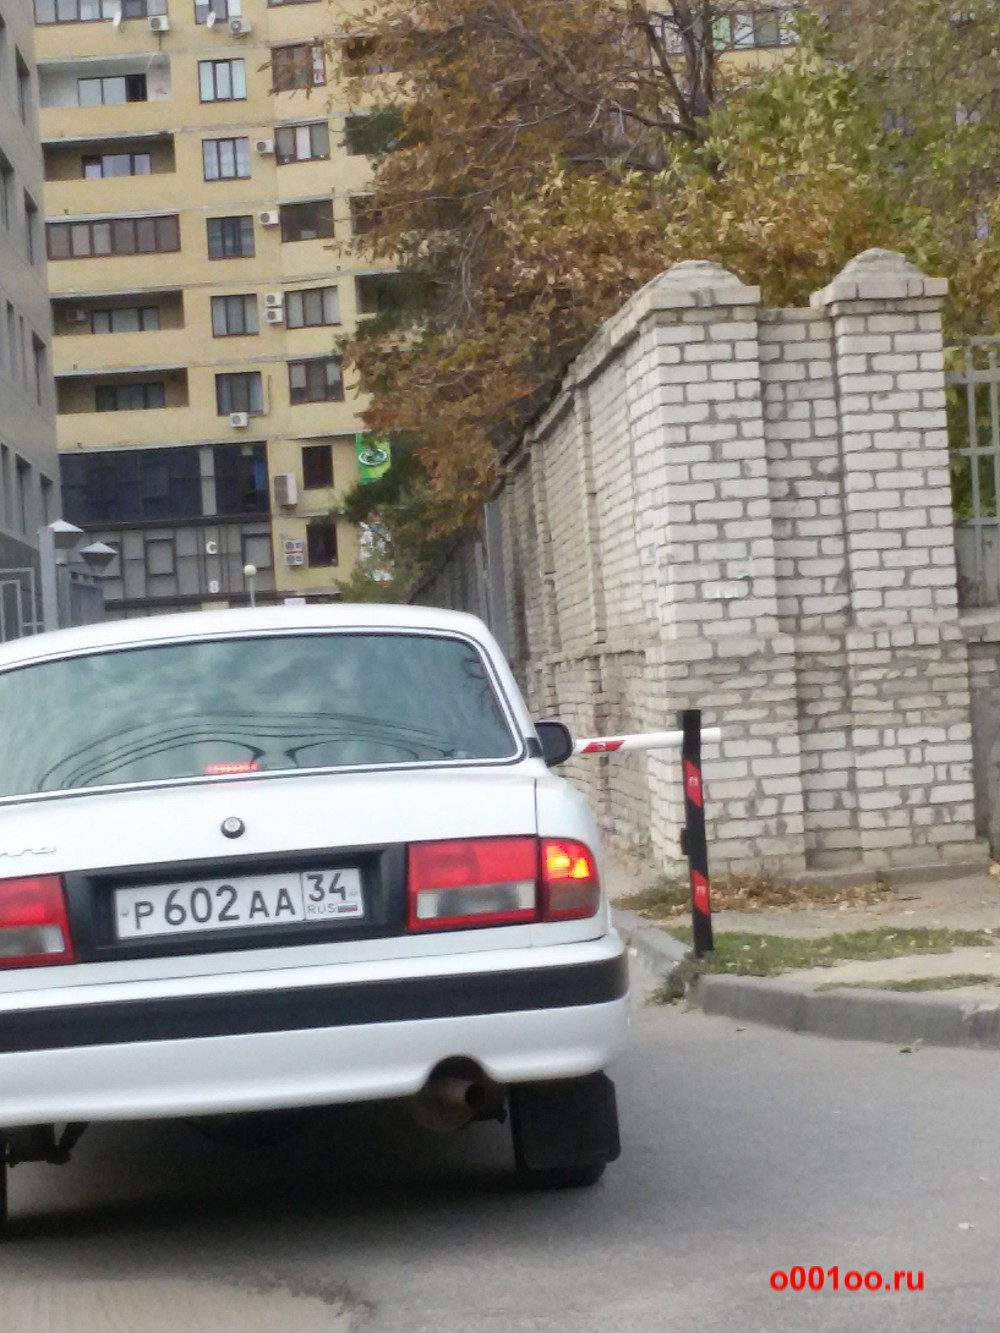 р602аа34